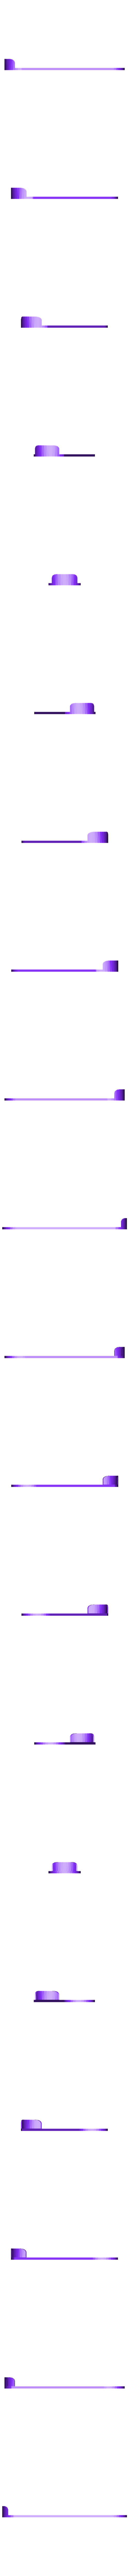 partie_basse.STL Download free STL file pedimeter • Object to 3D print, Thomy